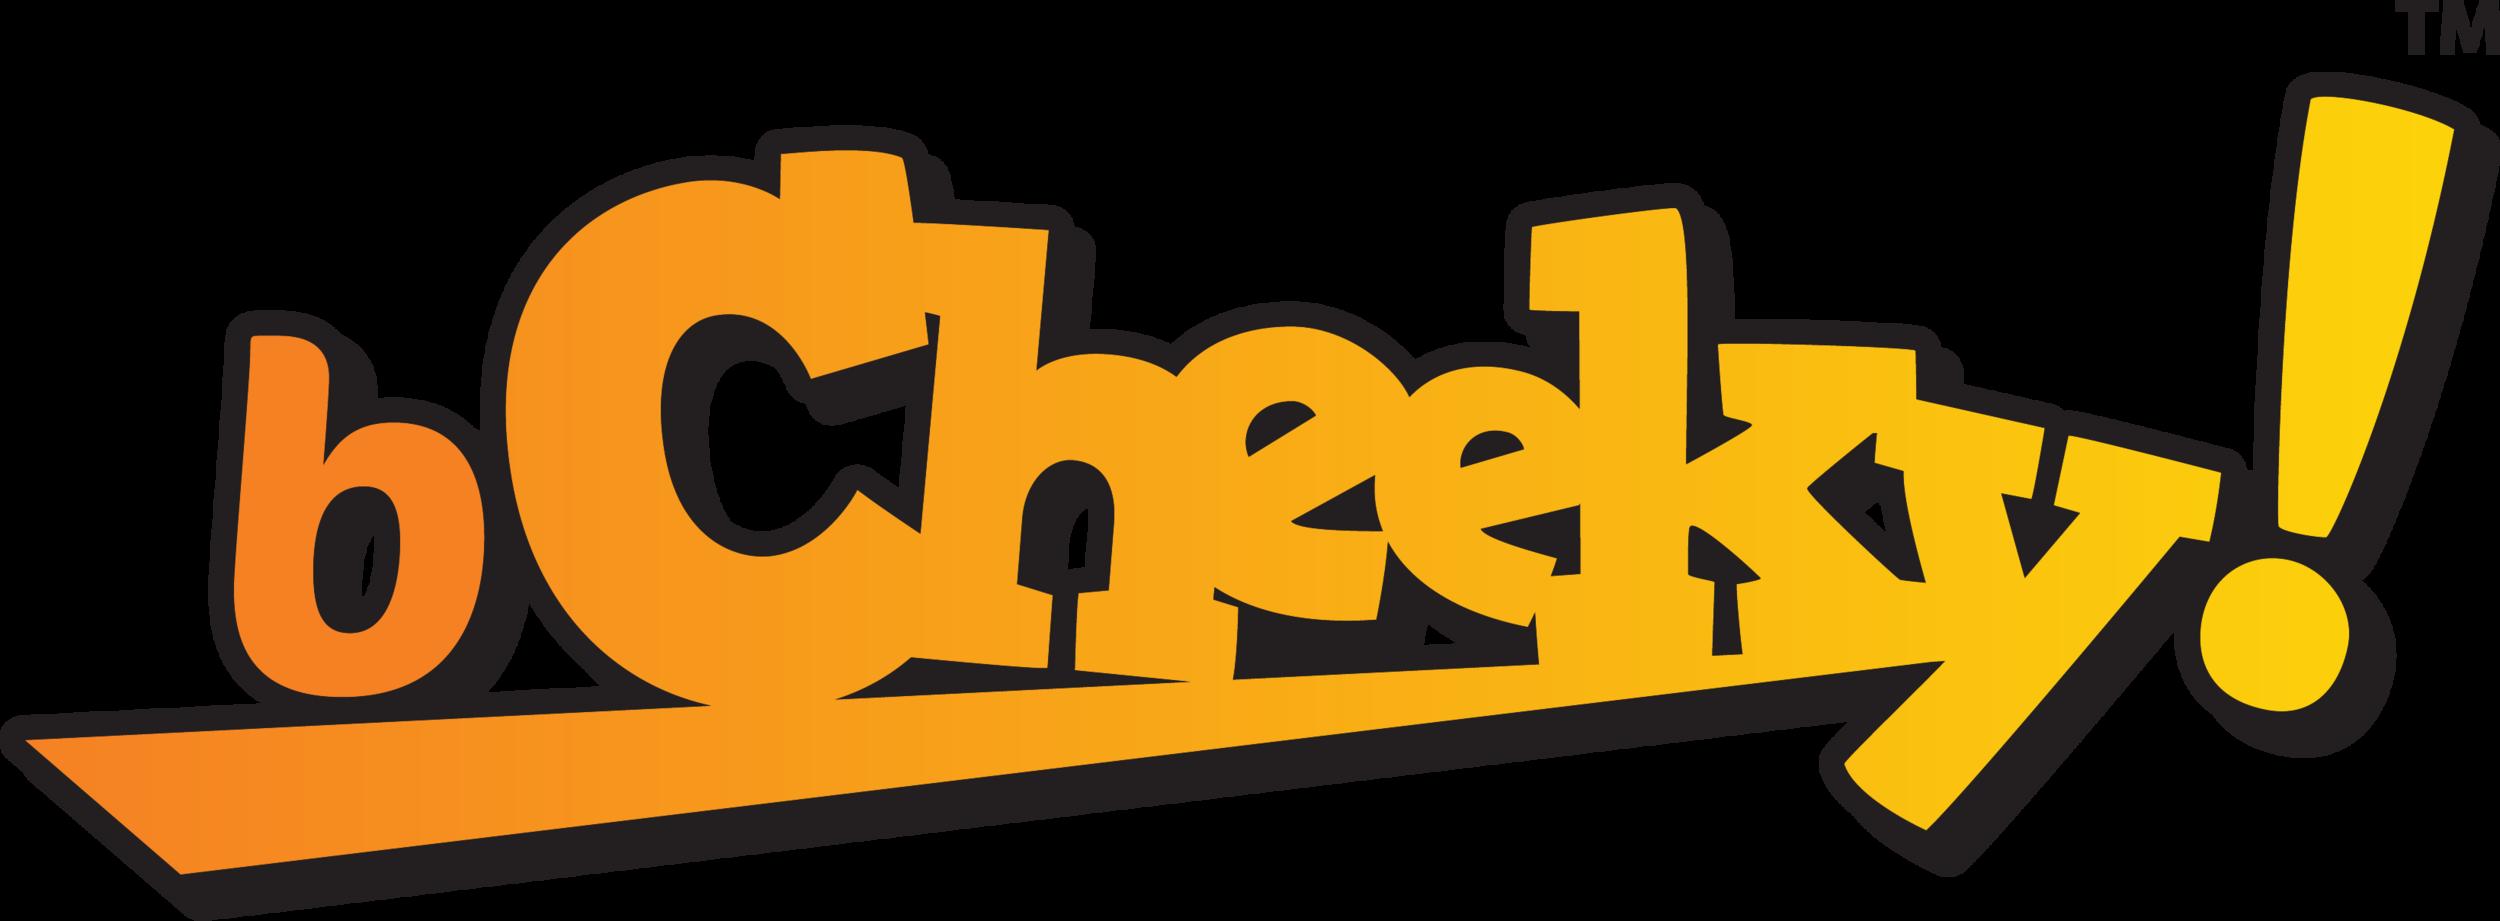 bCheeky App Logo -